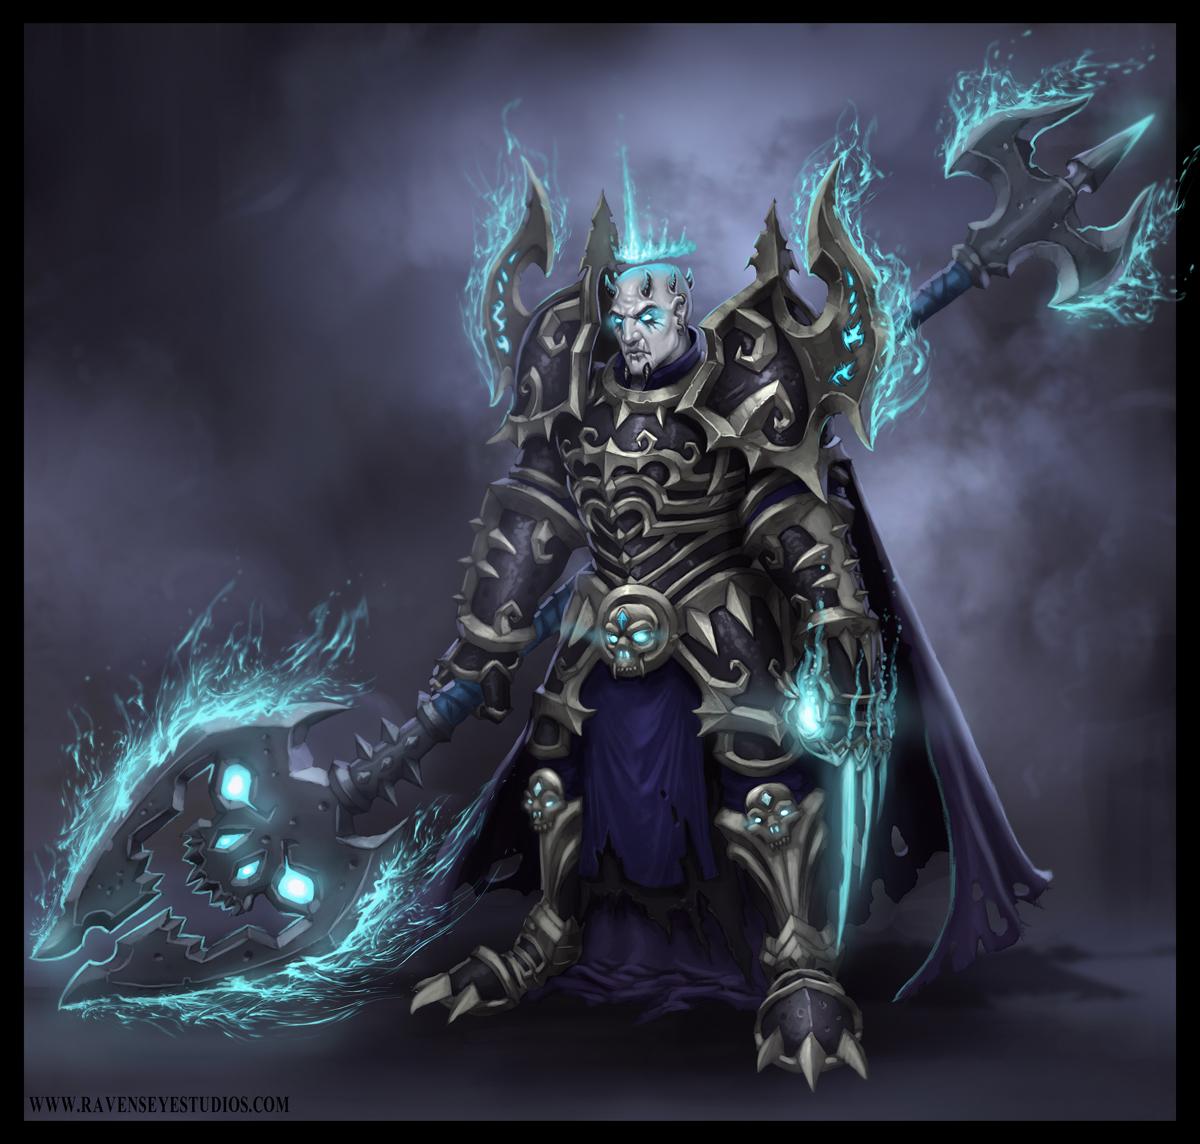 Knight Armor Concept Art